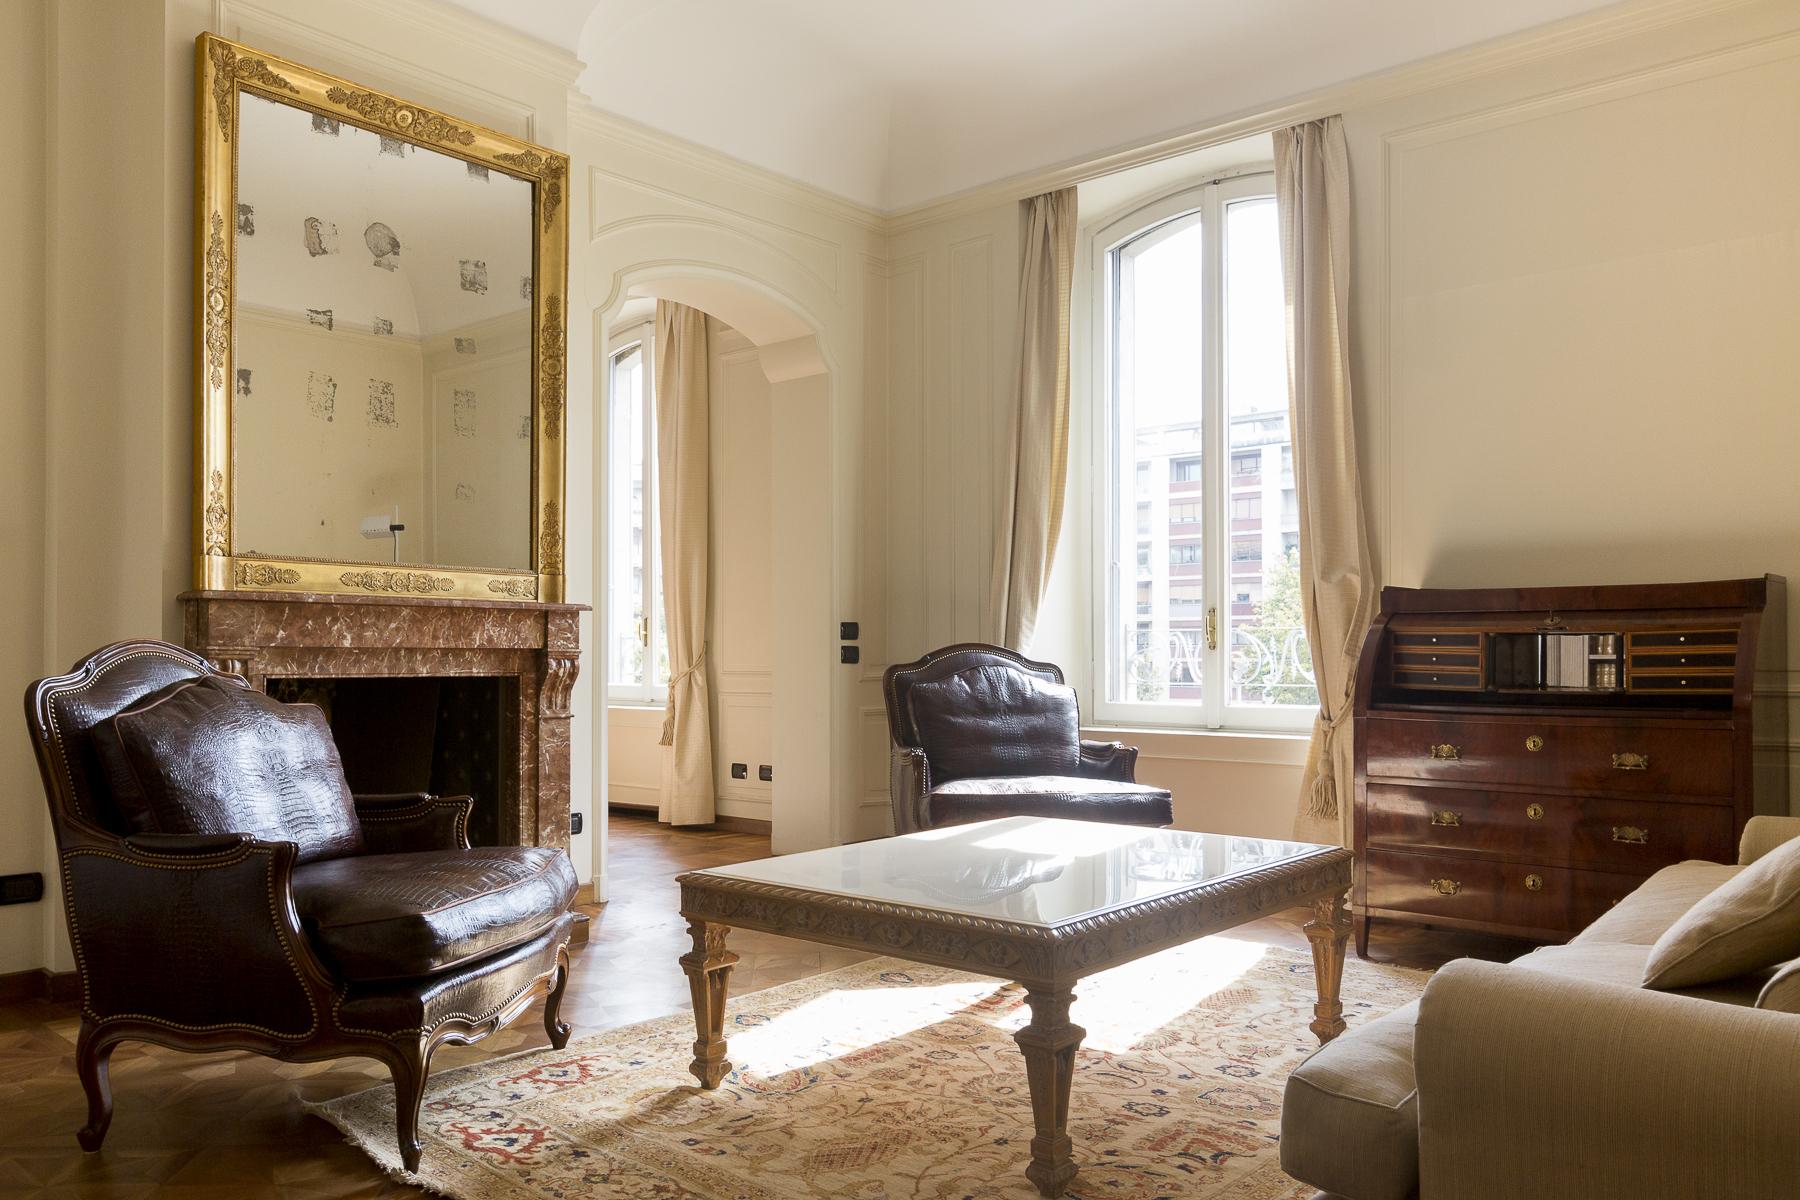 Appartement pour l à louer à Prestigious apartament in elegant historical building Corso Sempione Milano, Milan 20145 Italie